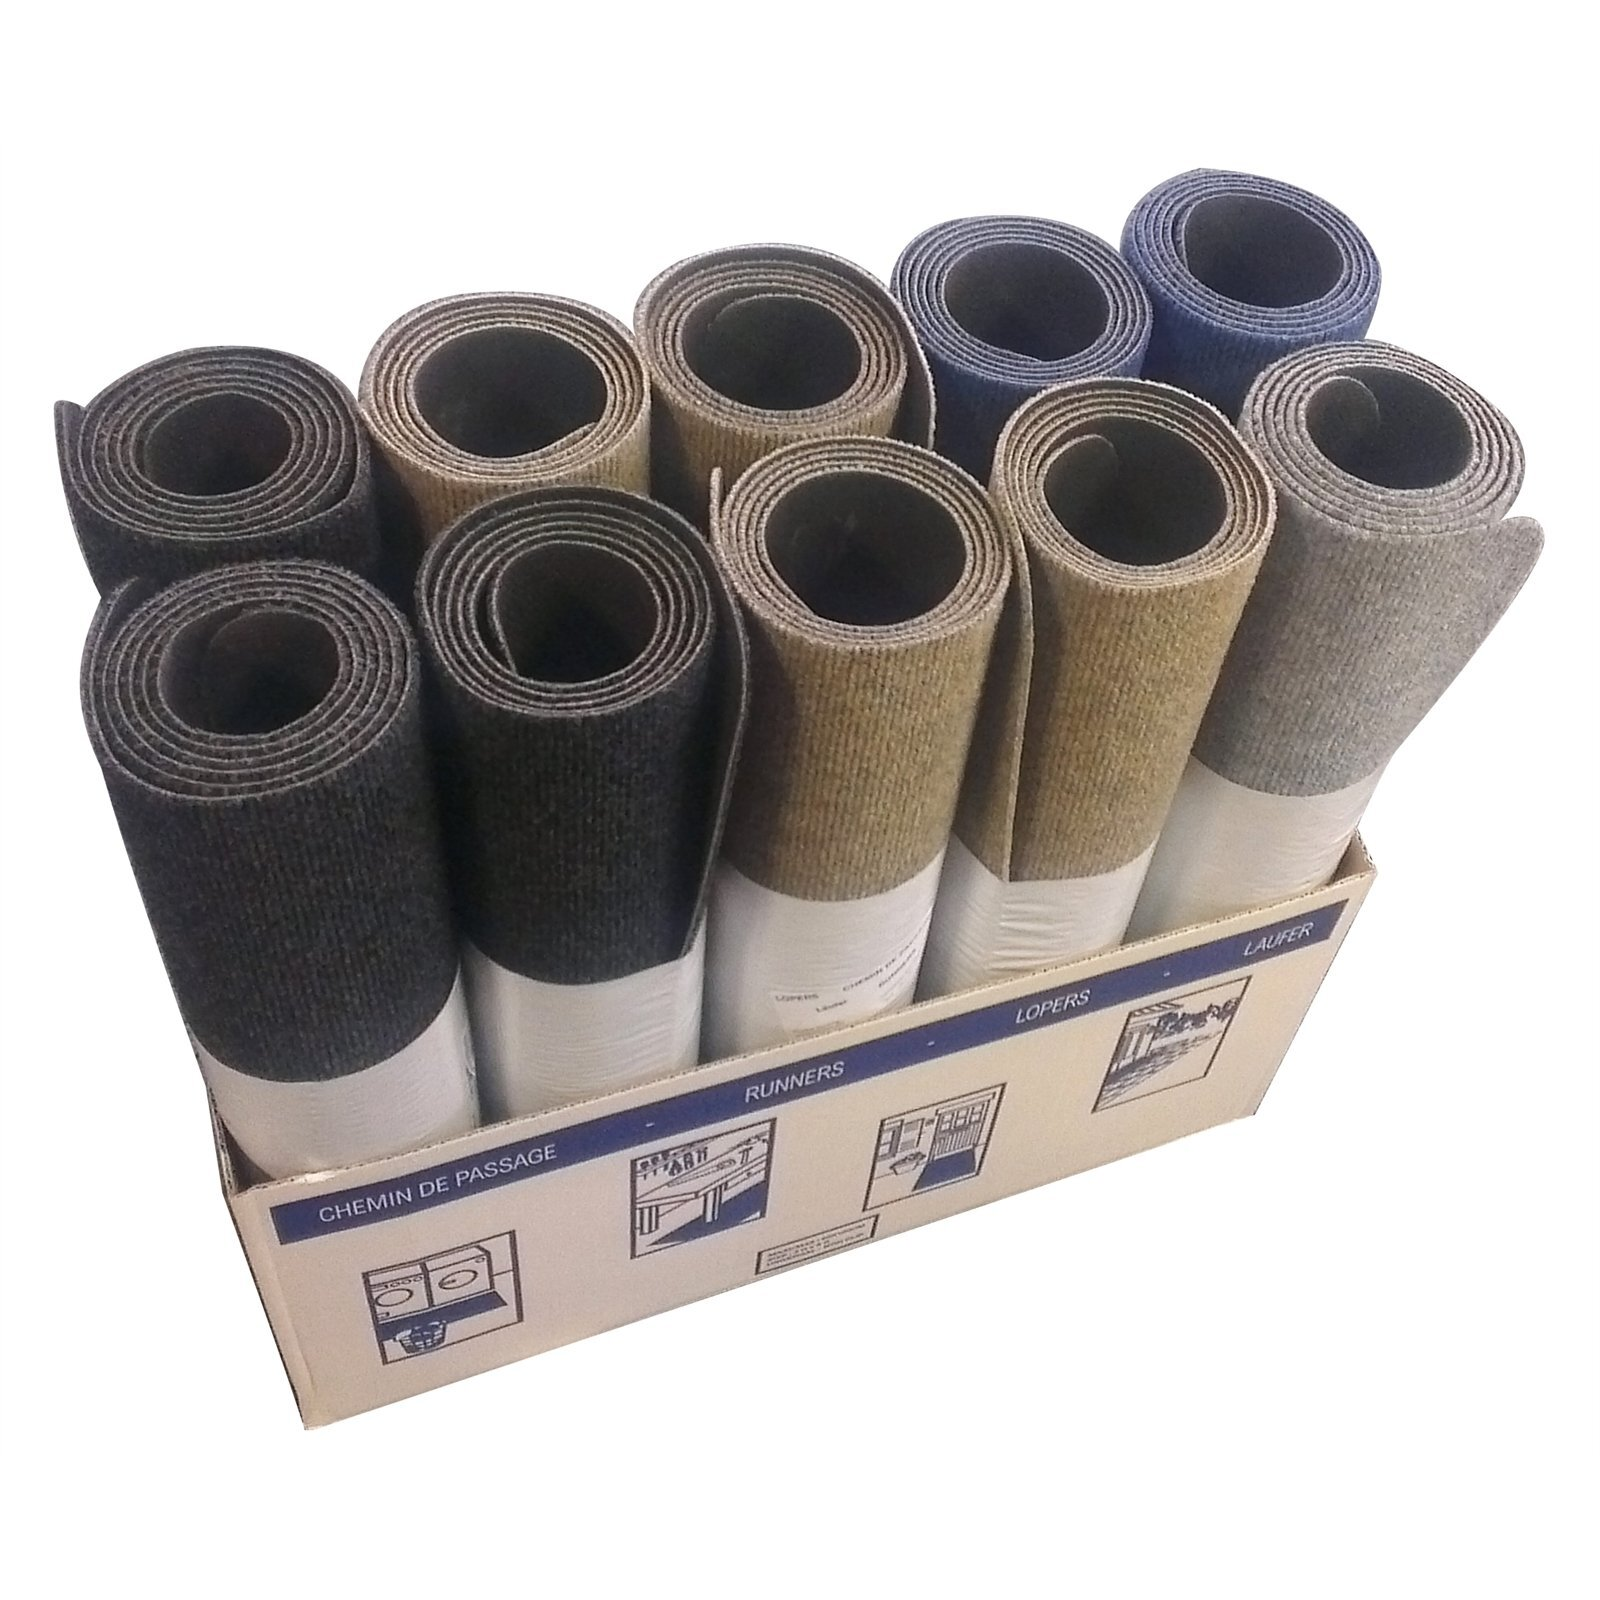 Ideal DIY Floors 60 x 180cm Kitchen Laundry Ribbed Carpet Runner Piece